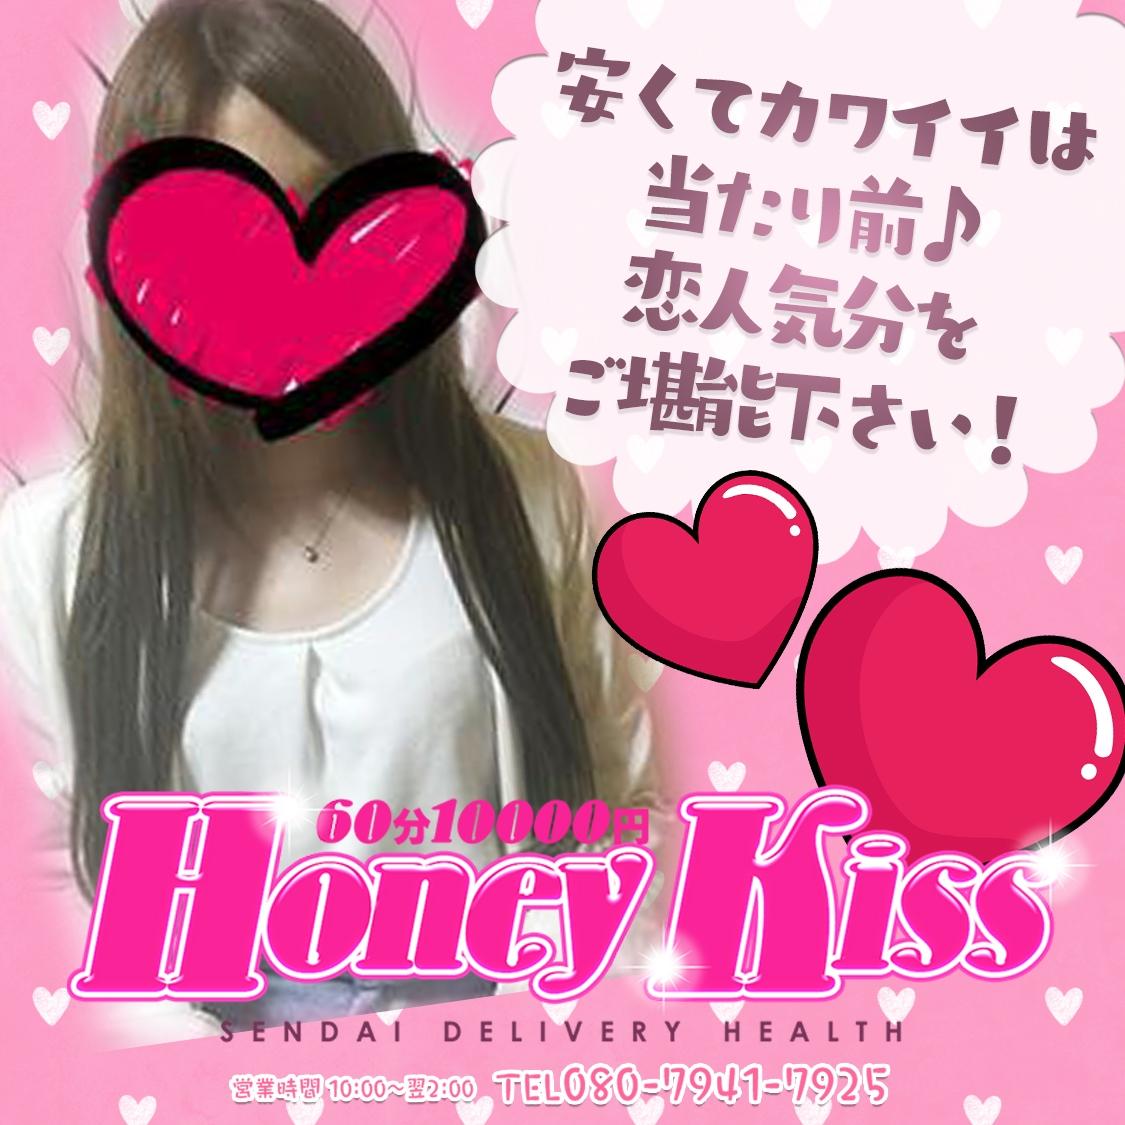 60分10000円 Honey kiss 仙台店